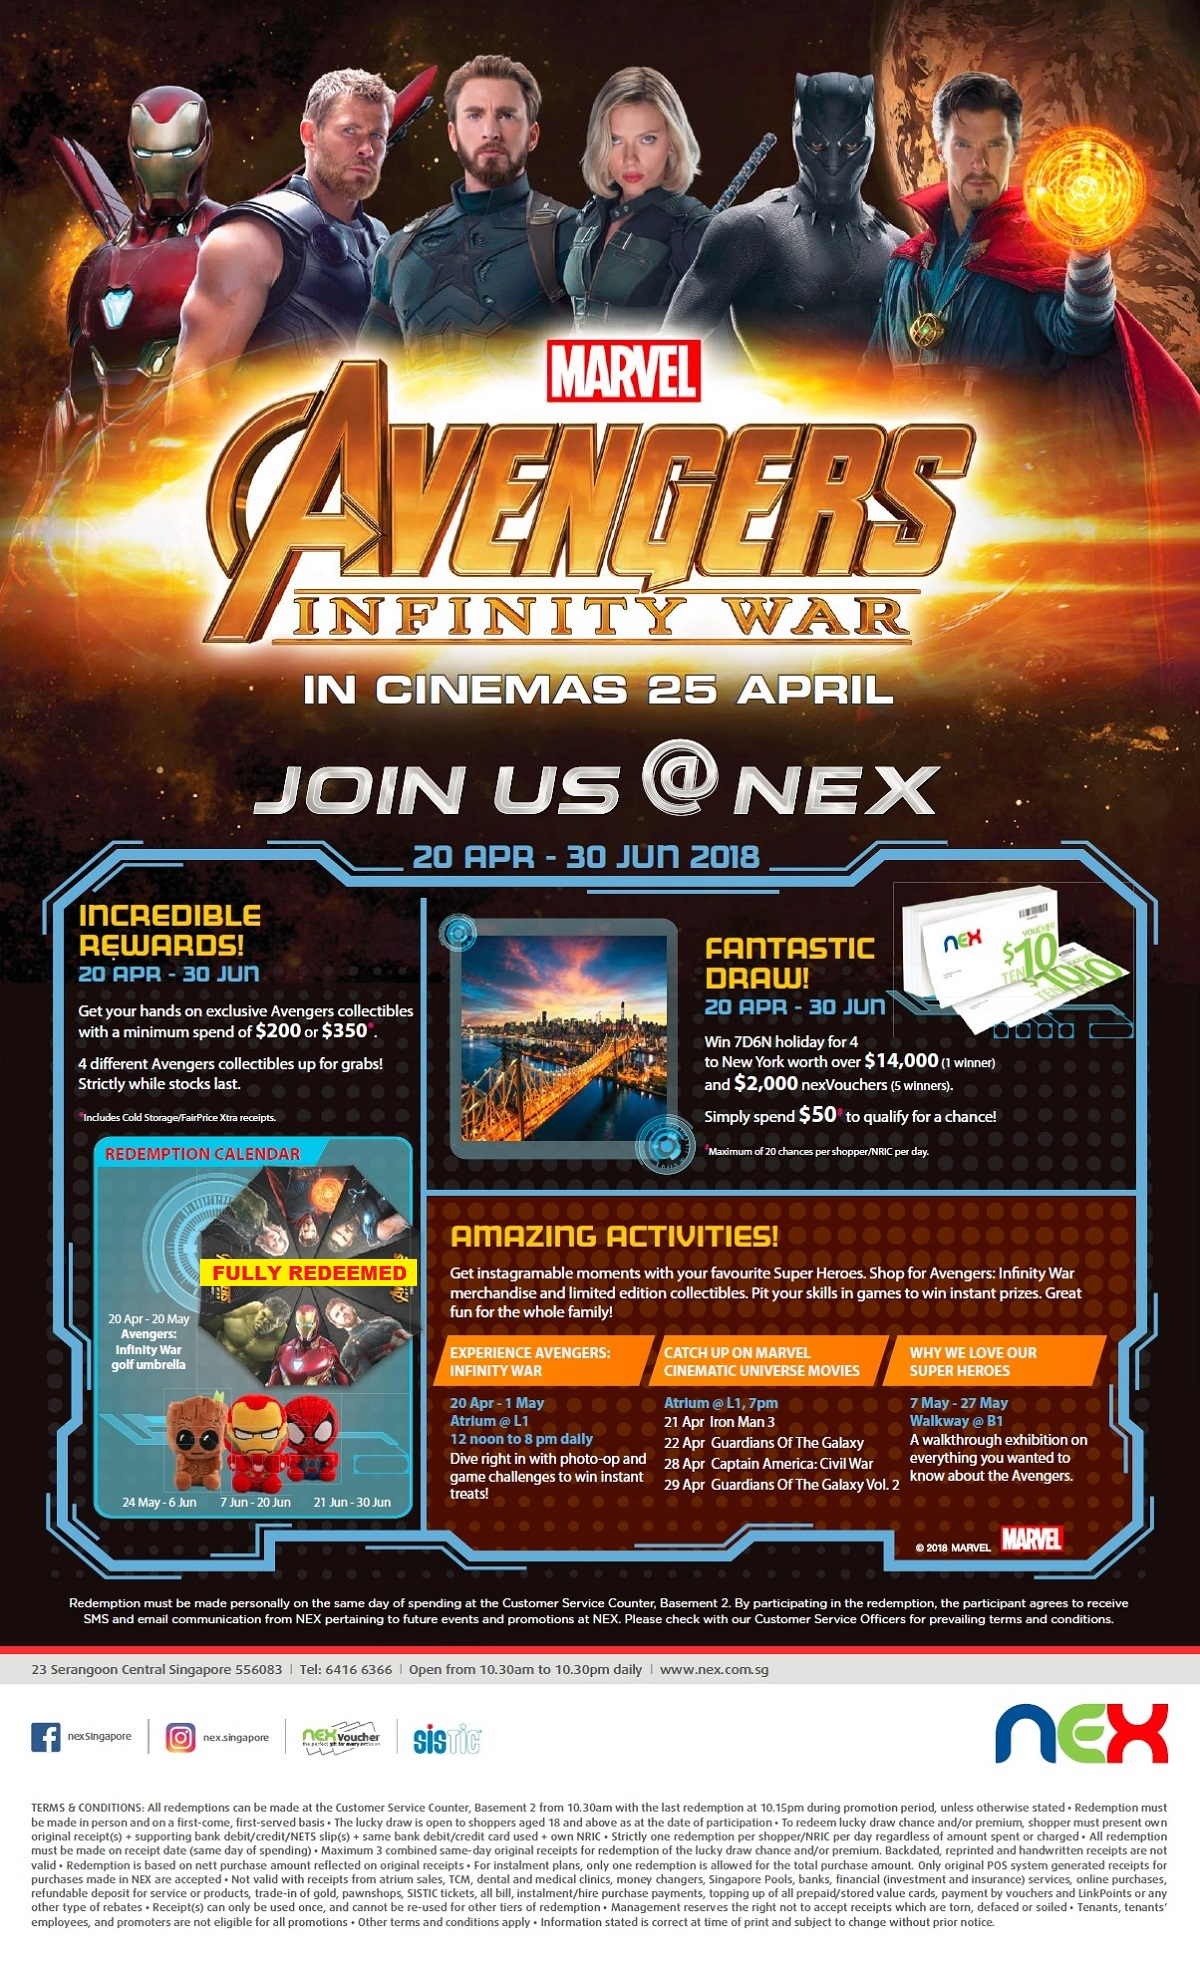 Avengers 2018 Campaign Web Poster 1 (umbrella redeemed)